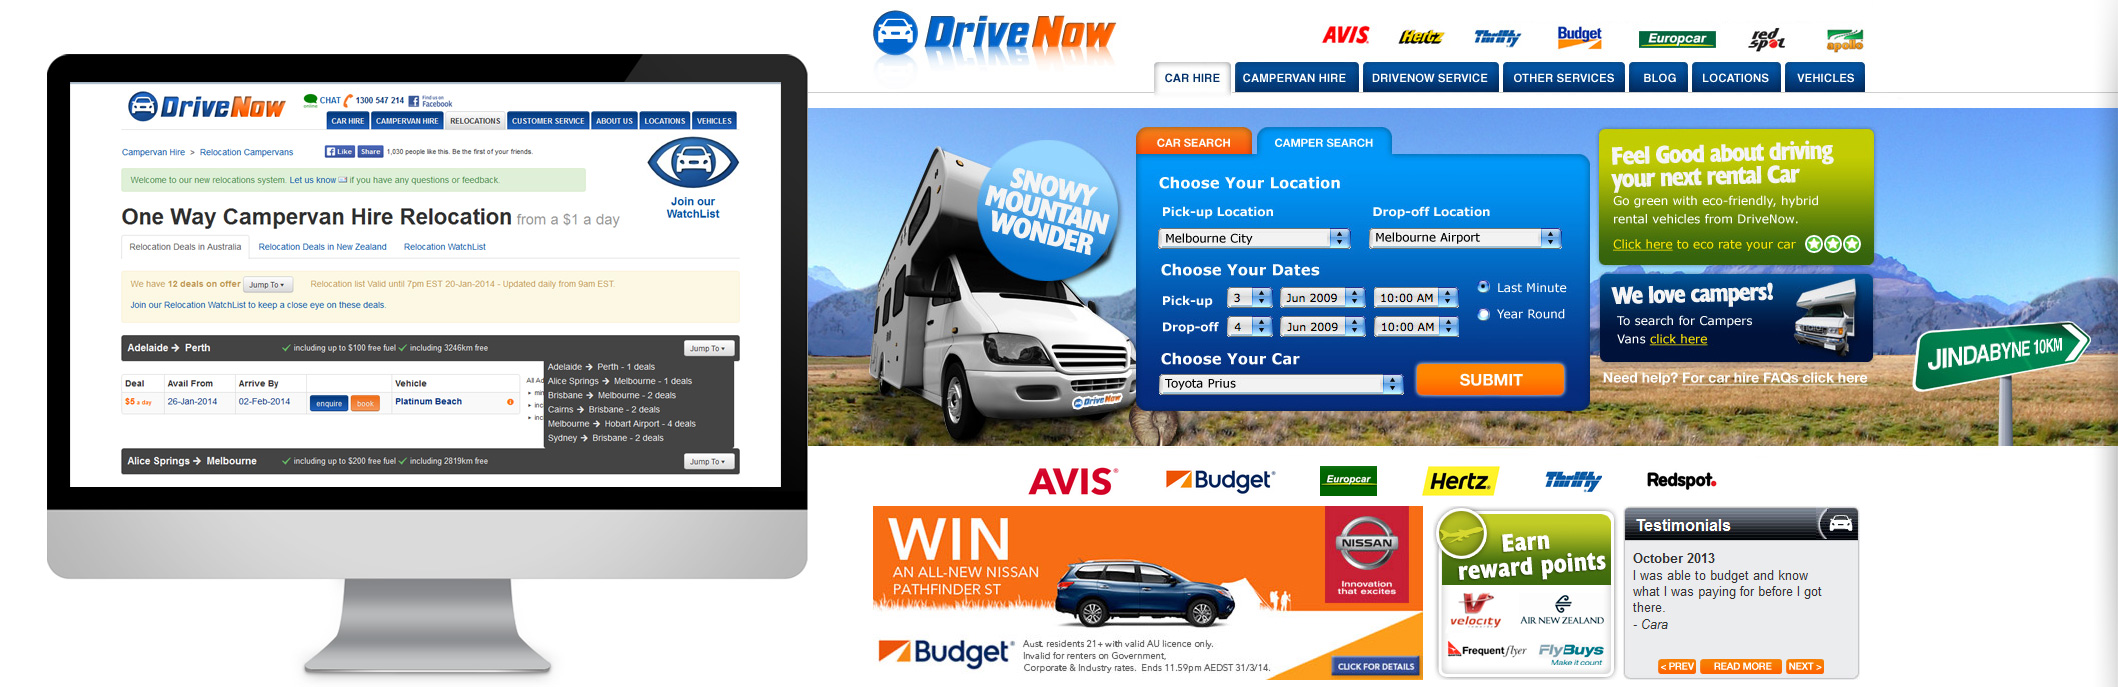 DriveNow-Large_02